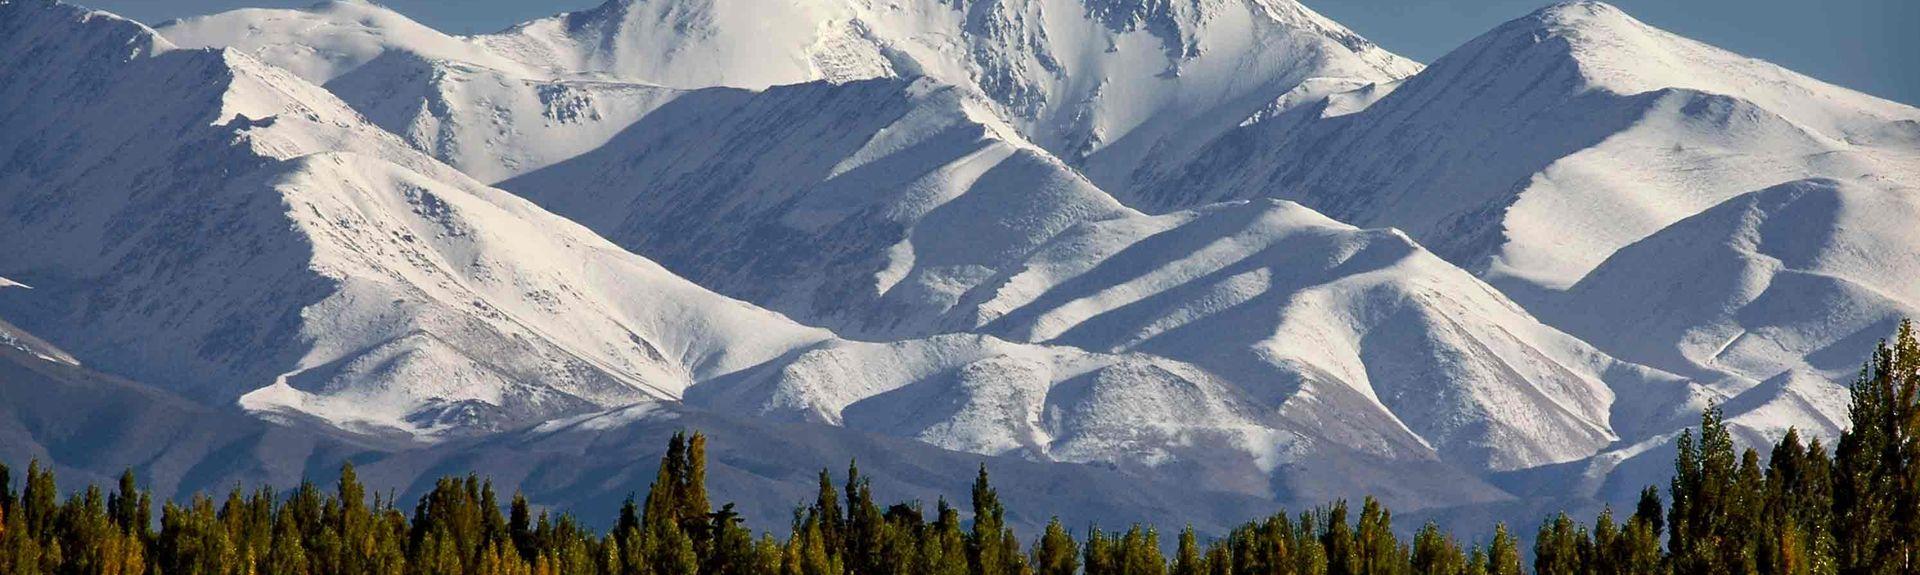 Mendoza, Mendoza (province), Argentina